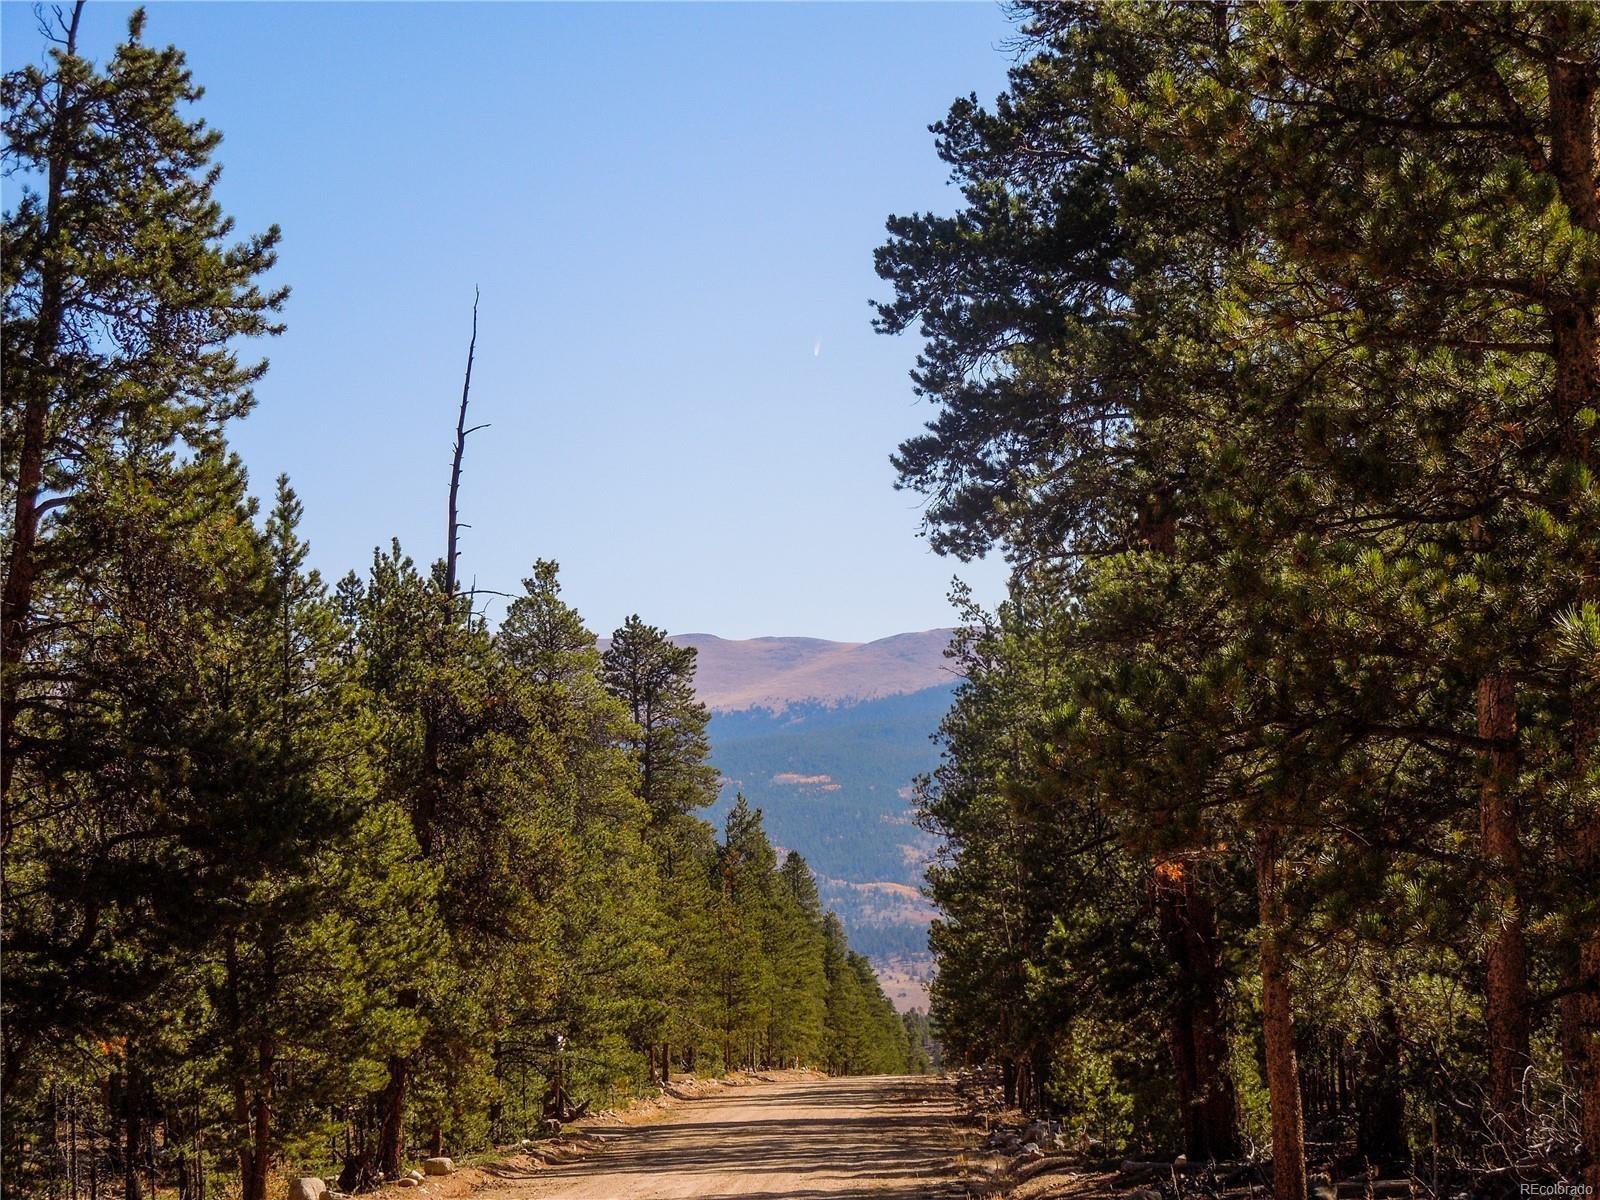 MLS# 8179364 - 15 - 852 Birch Drive, Twin Lakes, CO 81251